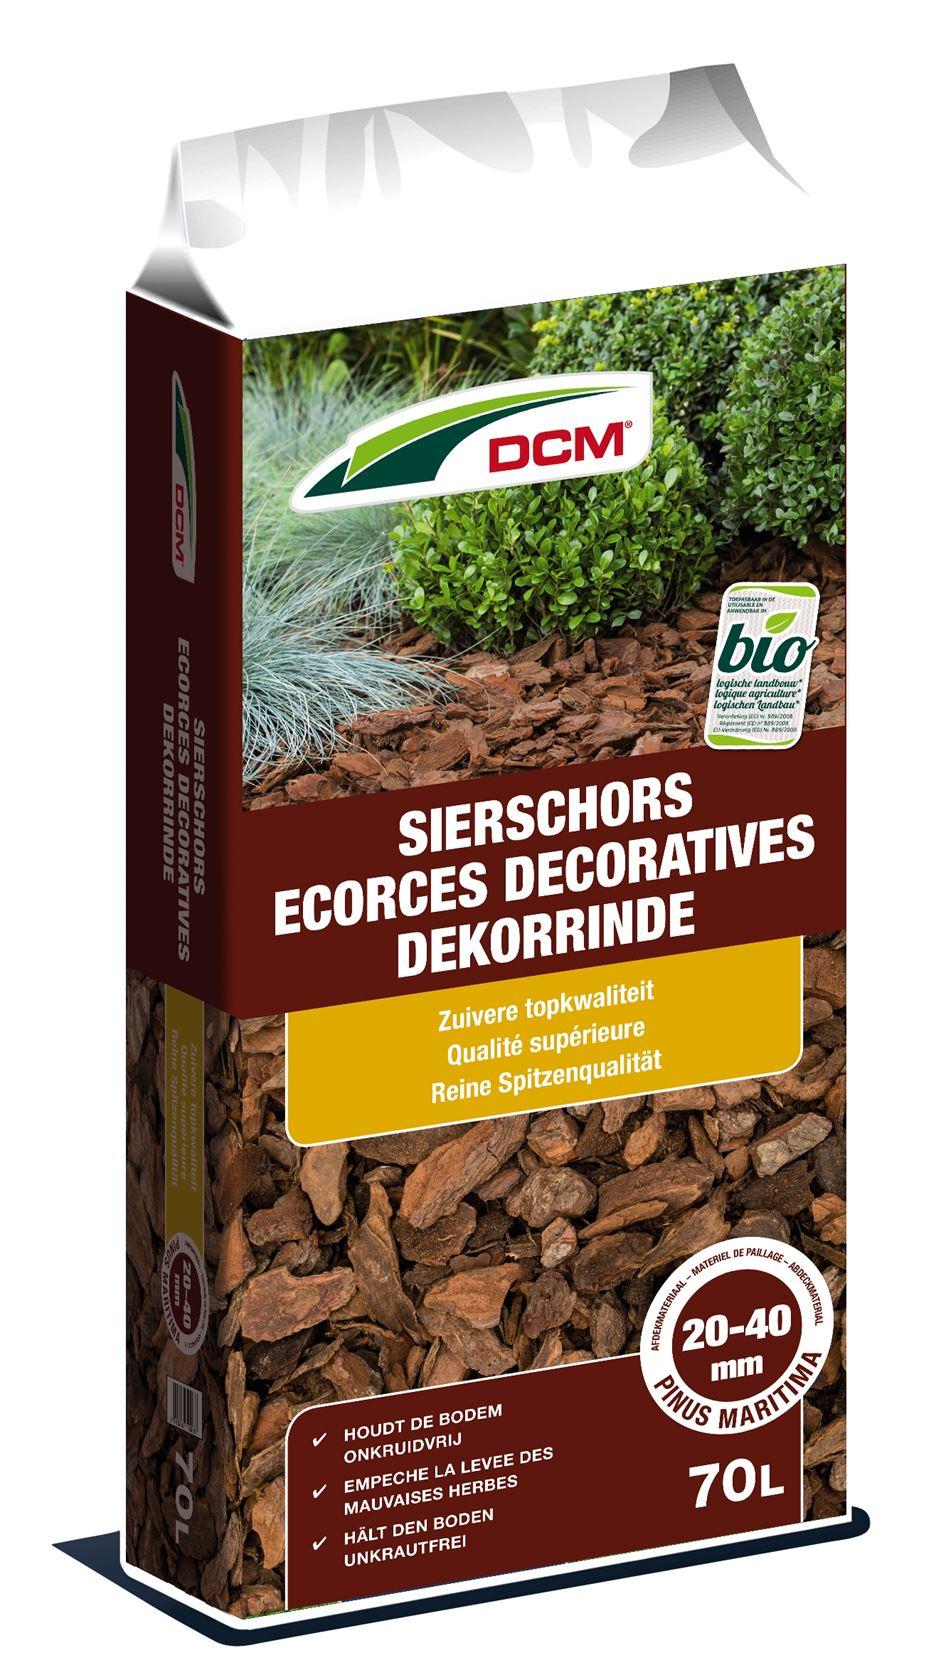 DCM-sierschors-20-40-mm-pinus-maritima-70L-Bio